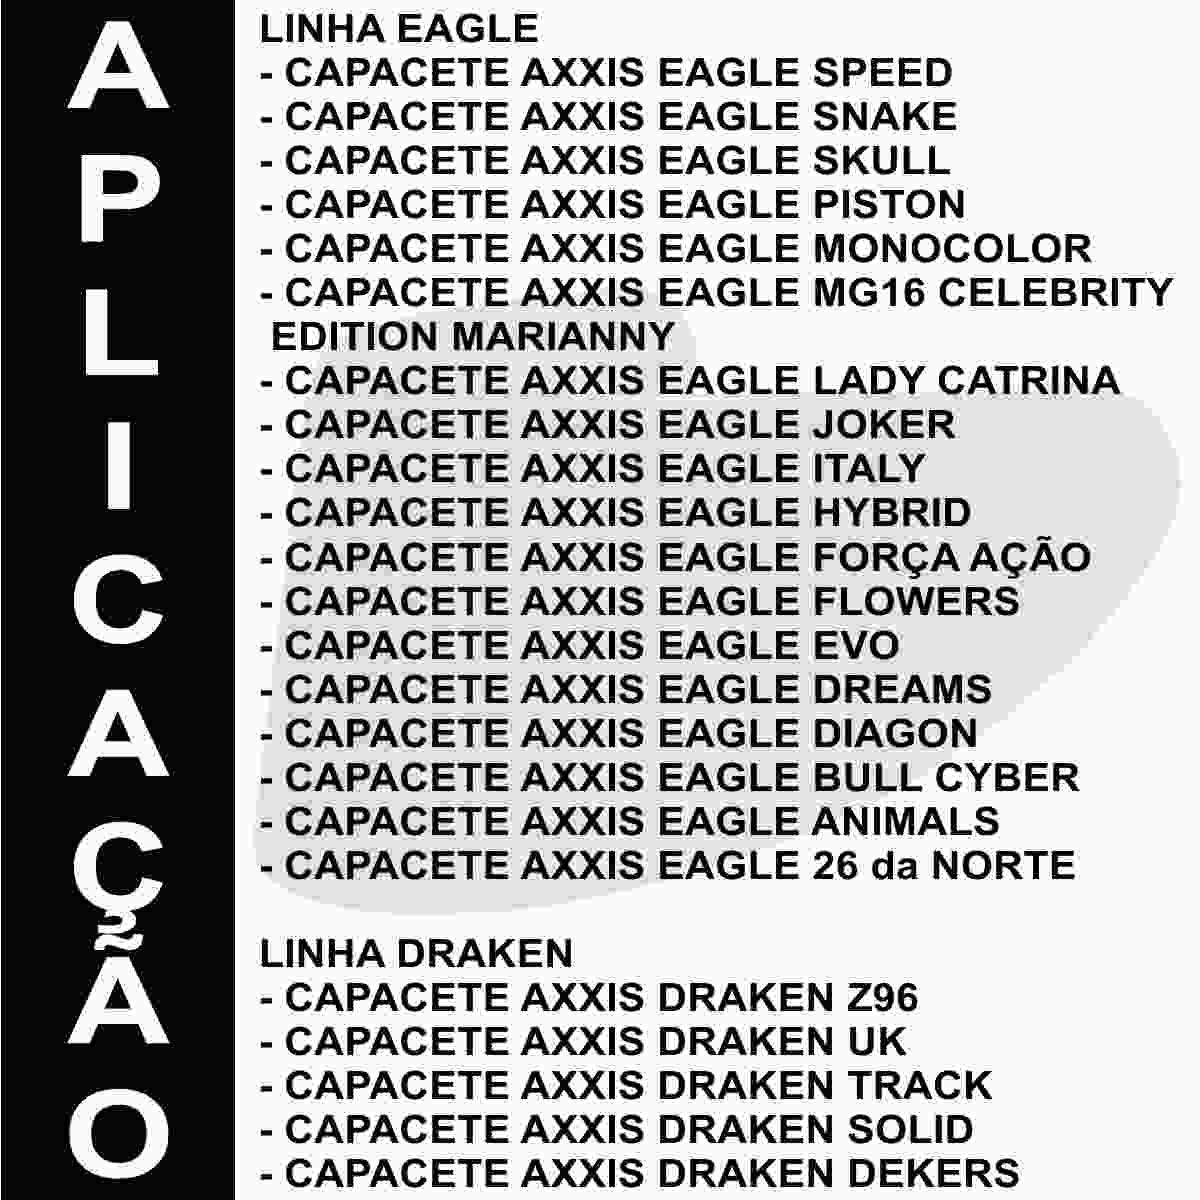 KIT VISEIRA AXXIS EAGLE/DRAKEN AZUL V18 + SISTEMA DE RETENÇÃO DE VISEIRA